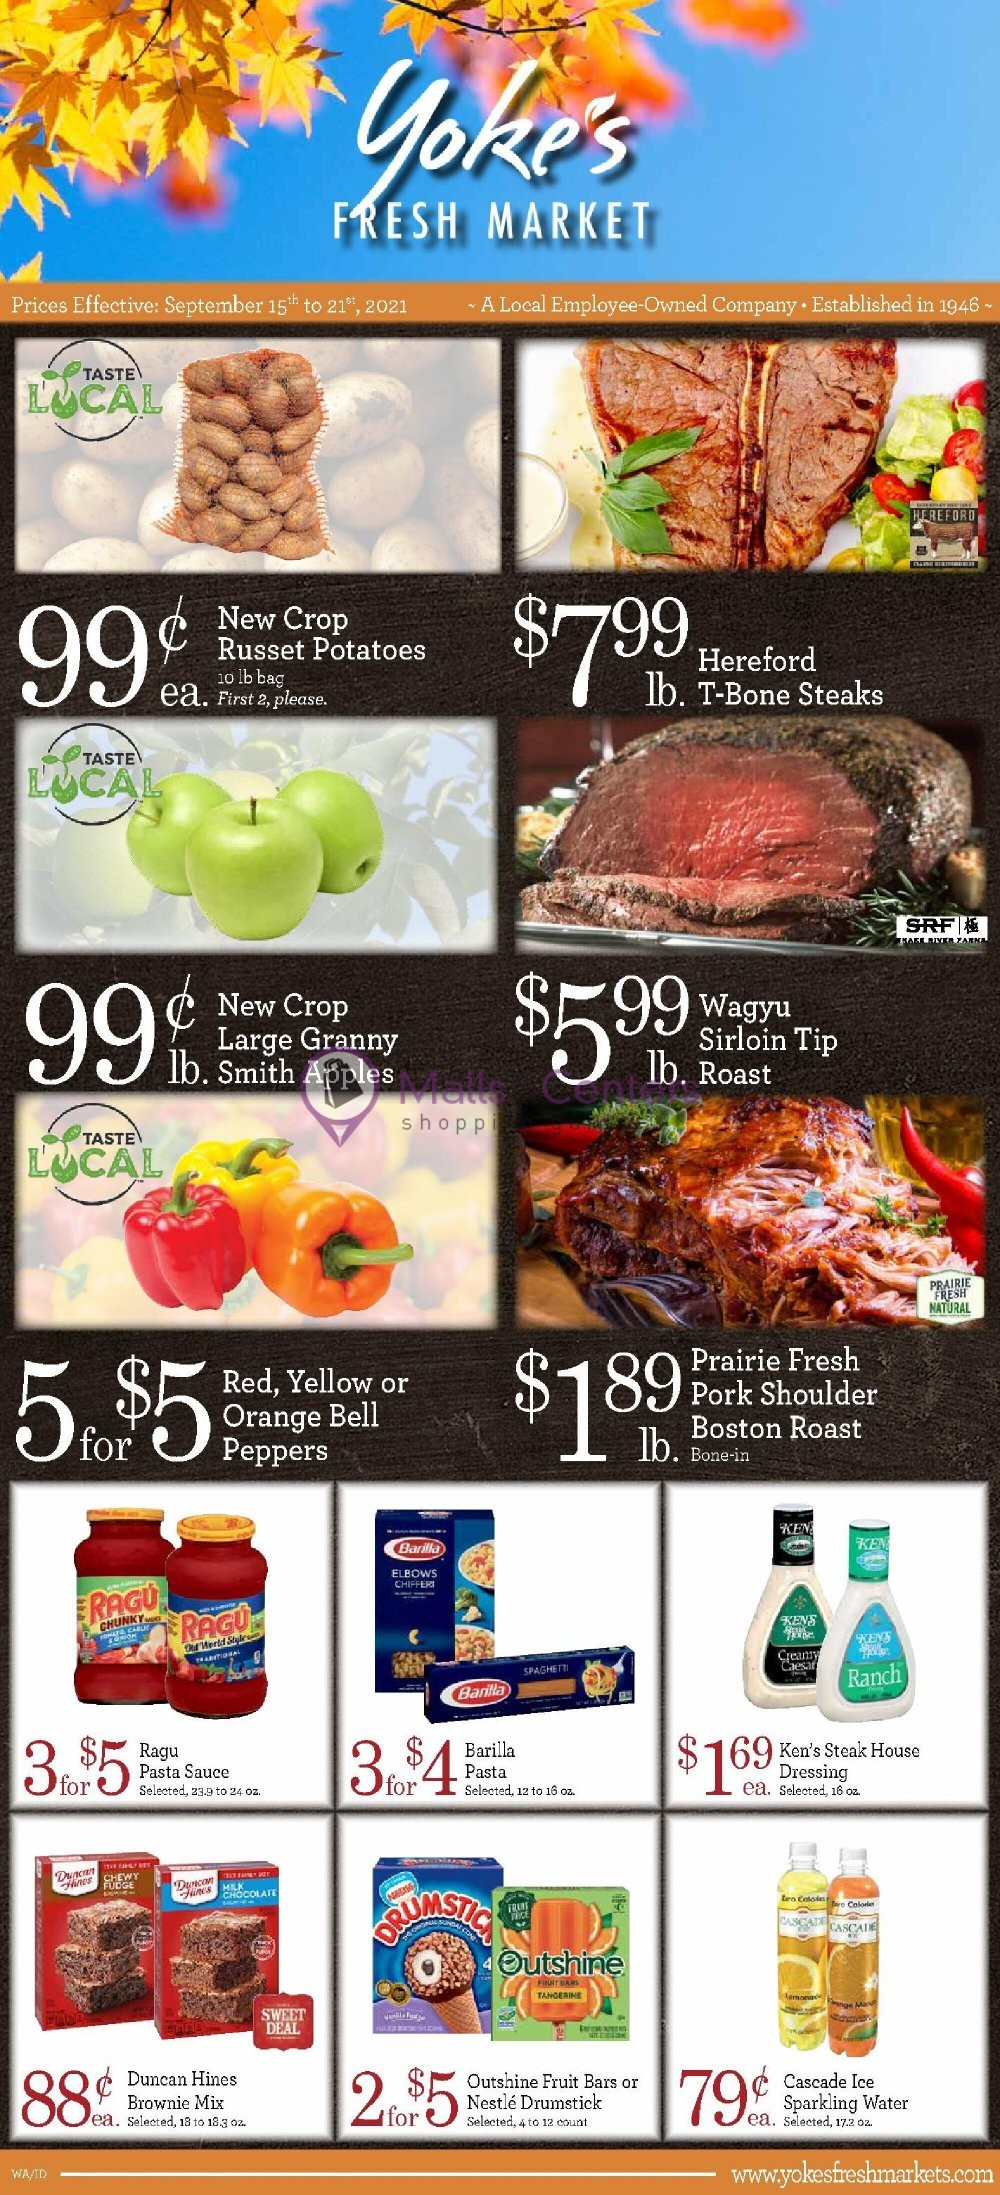 weekly ads Yoke's Fresh Markets - page 1 - mallscenters.com